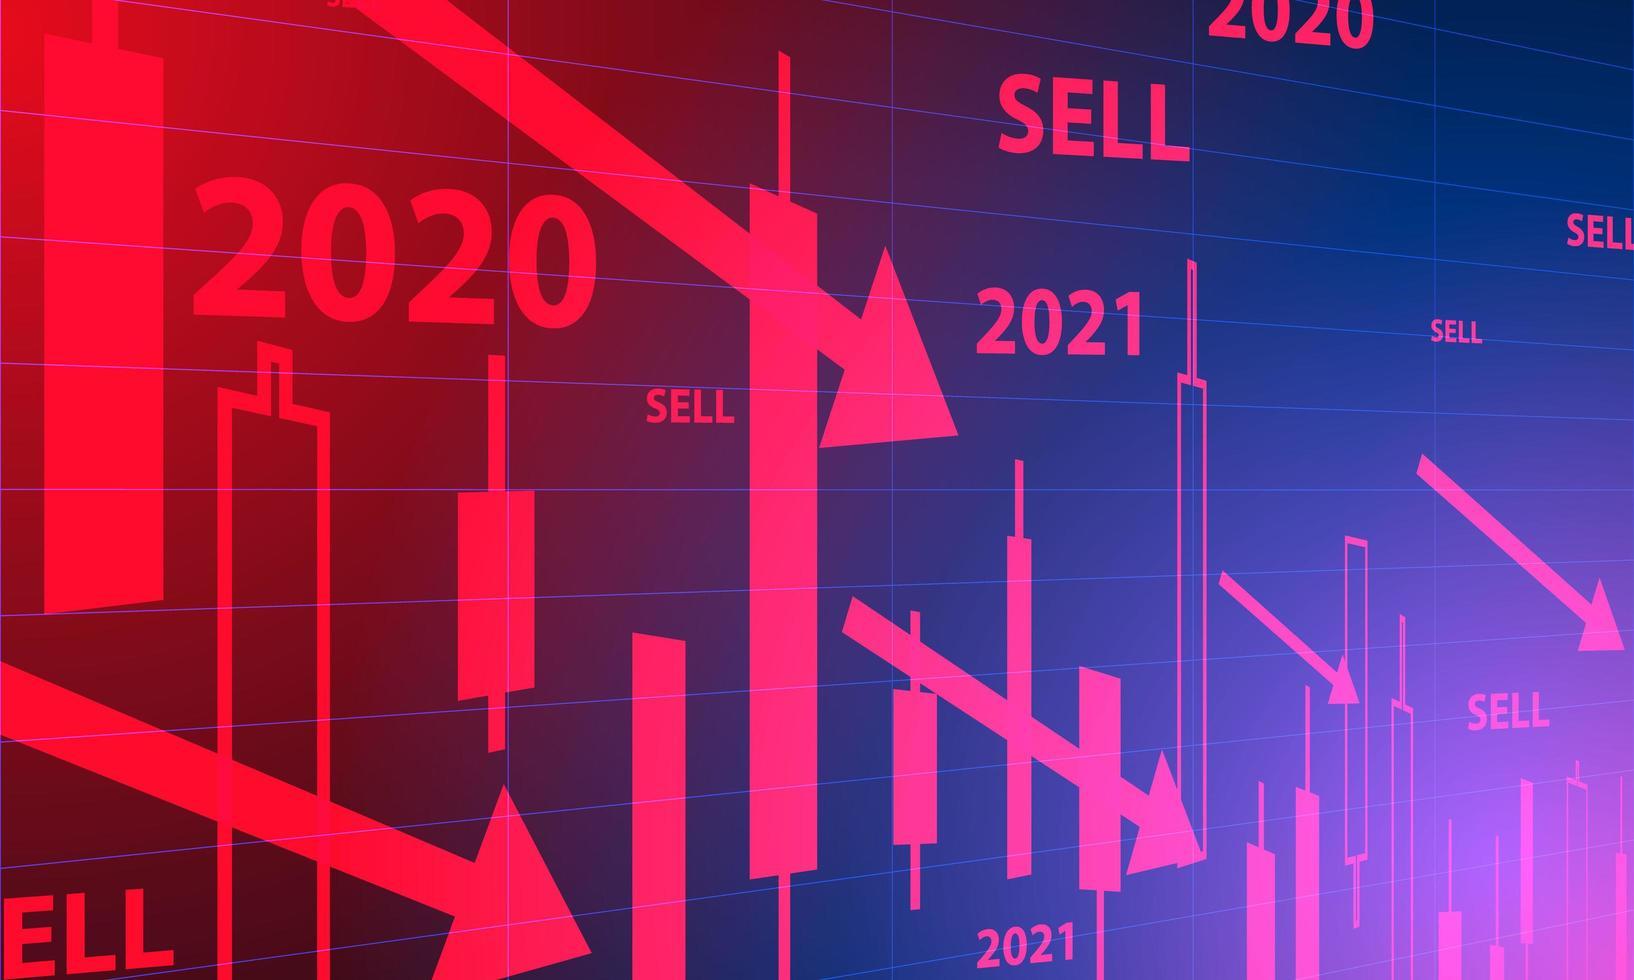 Börsenhintergrund vektor